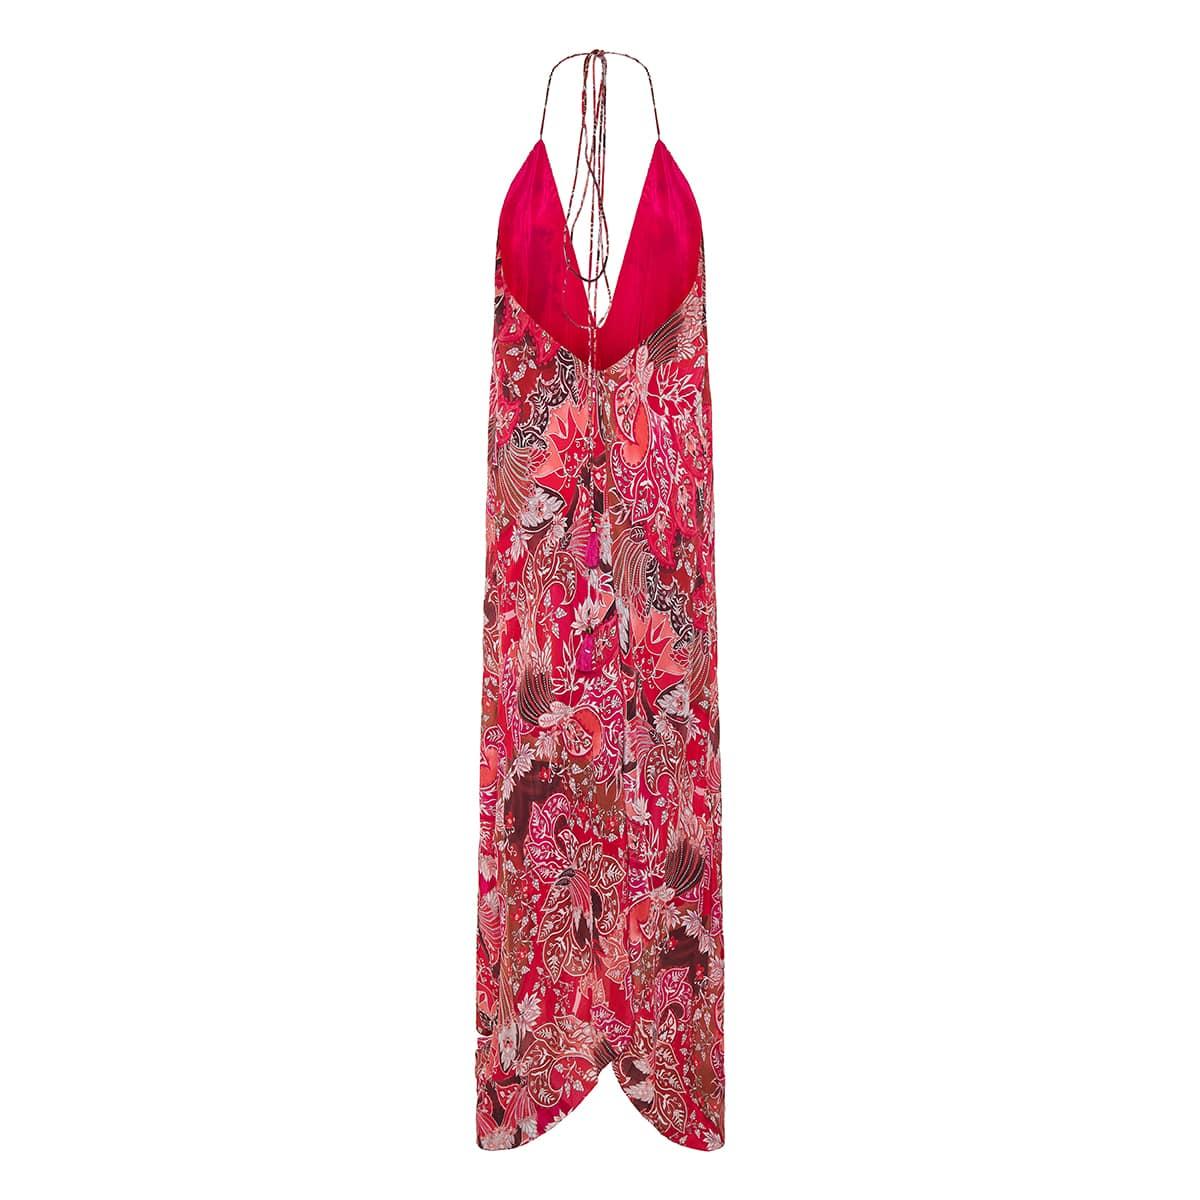 Cho printed long halterneck dress